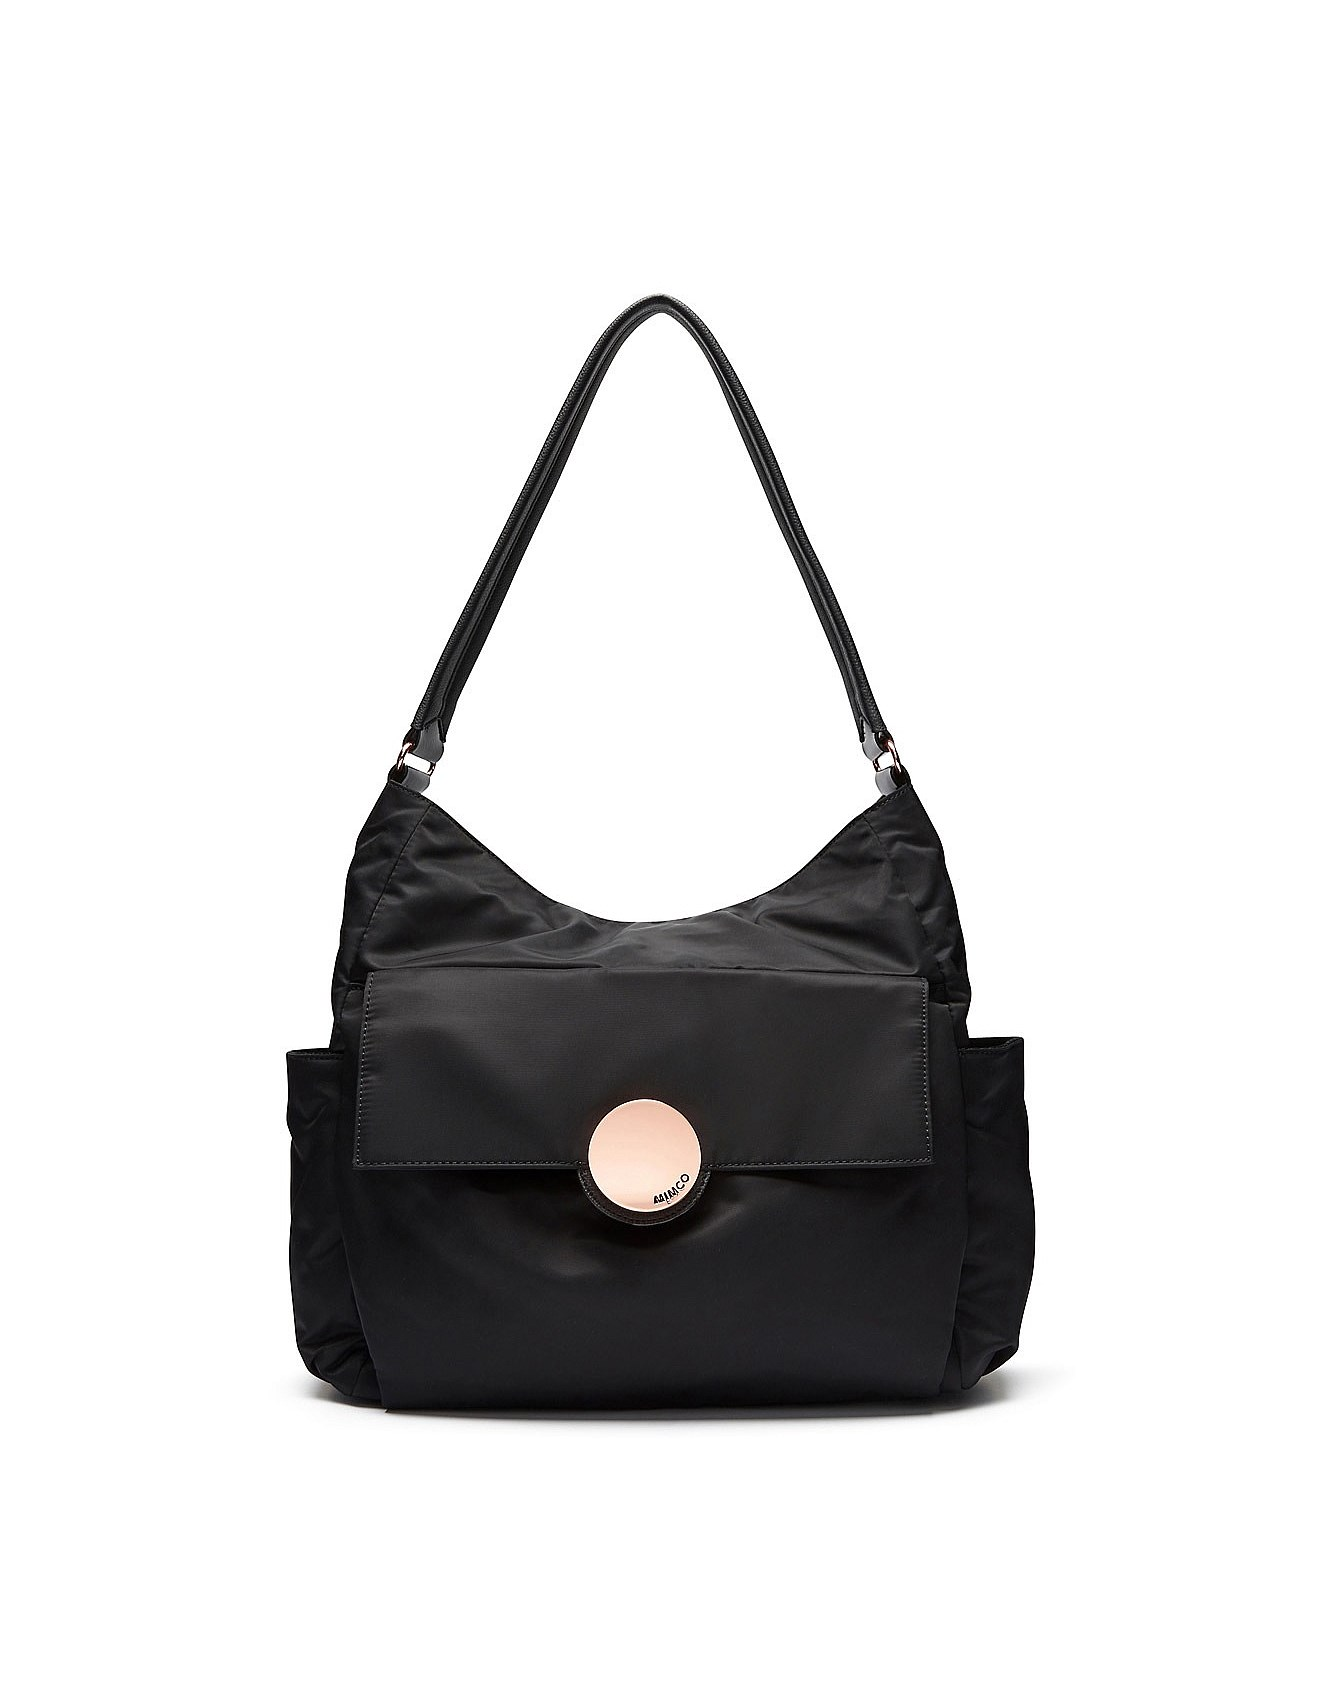 Waver Hobo Baby Bag Special Offer Mimco